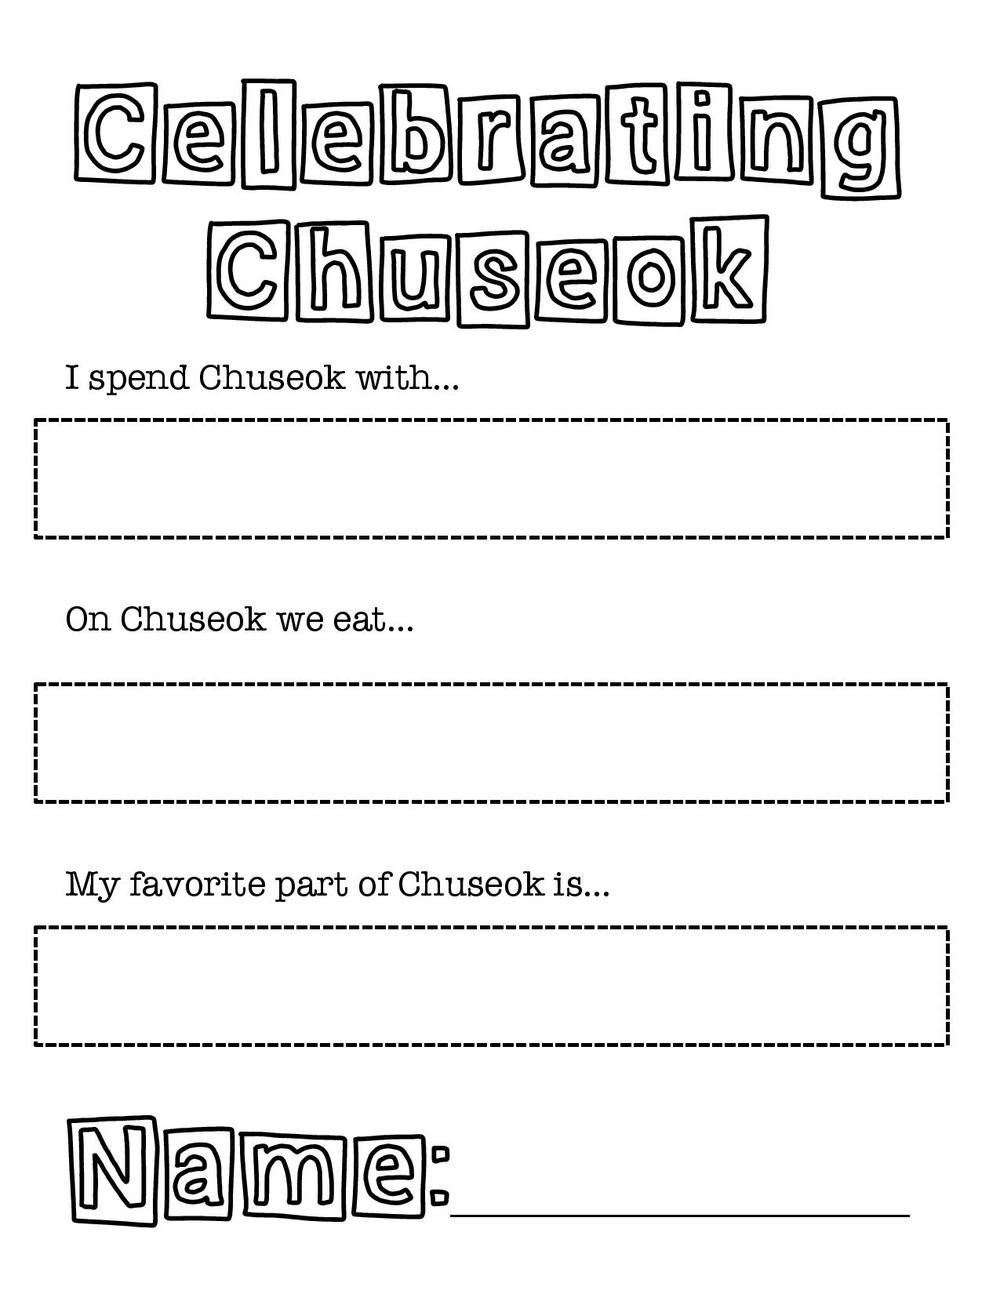 Celebrating Chuseok ESL Kindergarten Worksheet   ESL   Pinterest ...